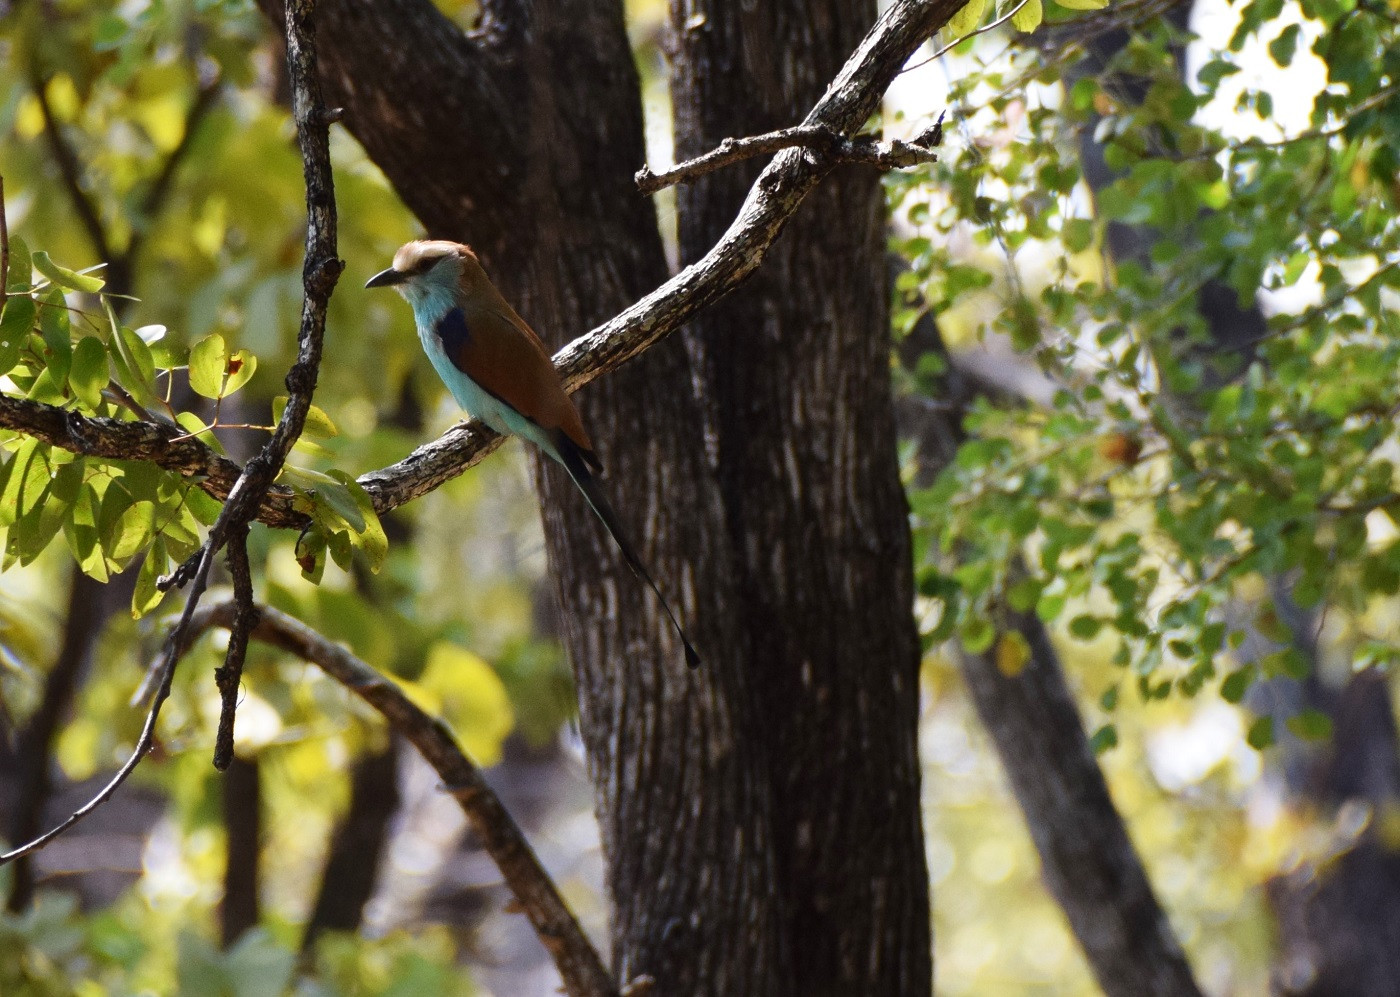 Fantastic birding location with rare species